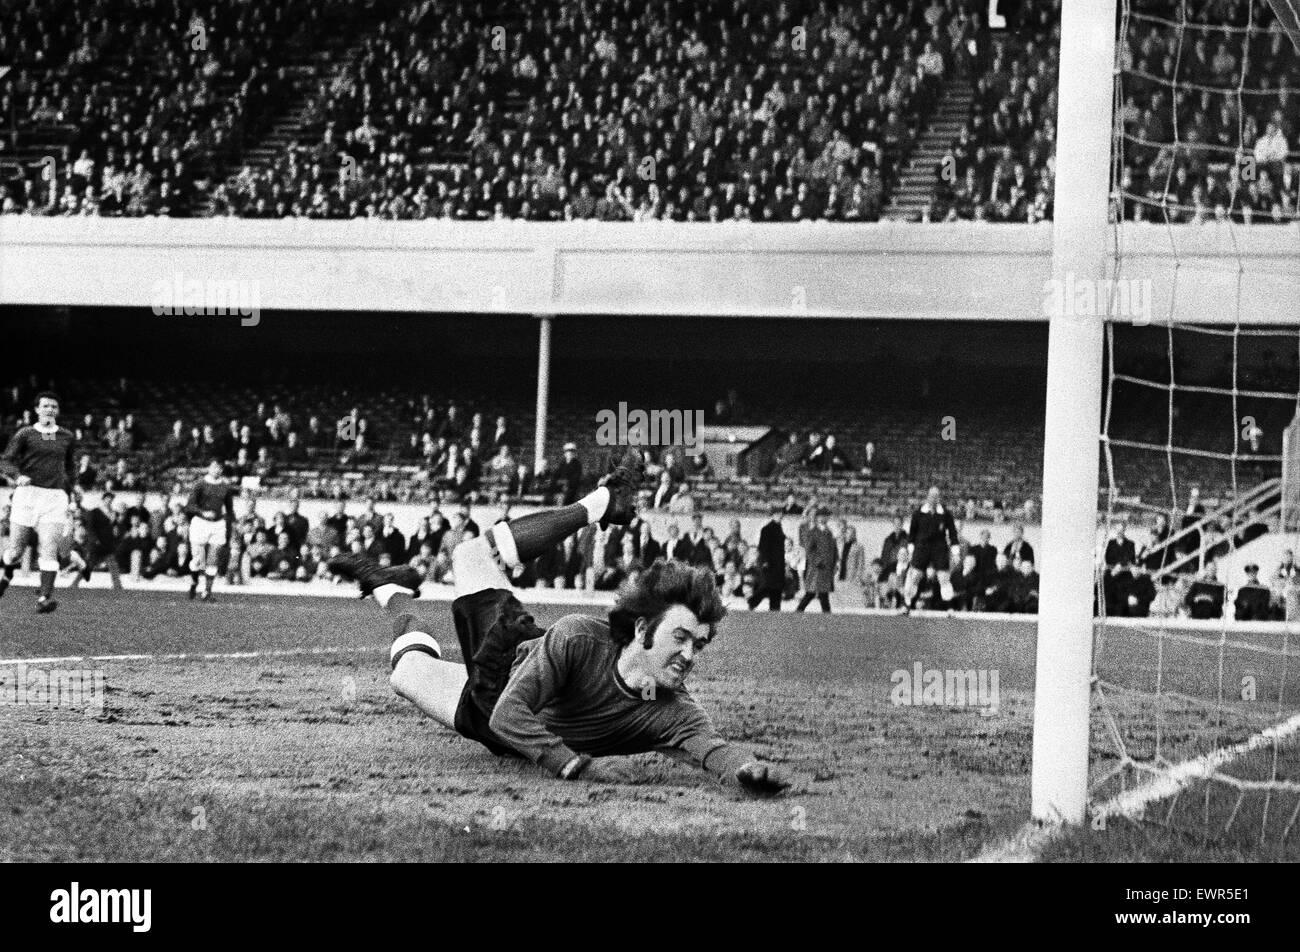 Andy Rankin, Everton goalkeeper. Arsenal v Everton, League Division One, played at Highbury. Score - 3-1 to Arsenal. - Stock Image